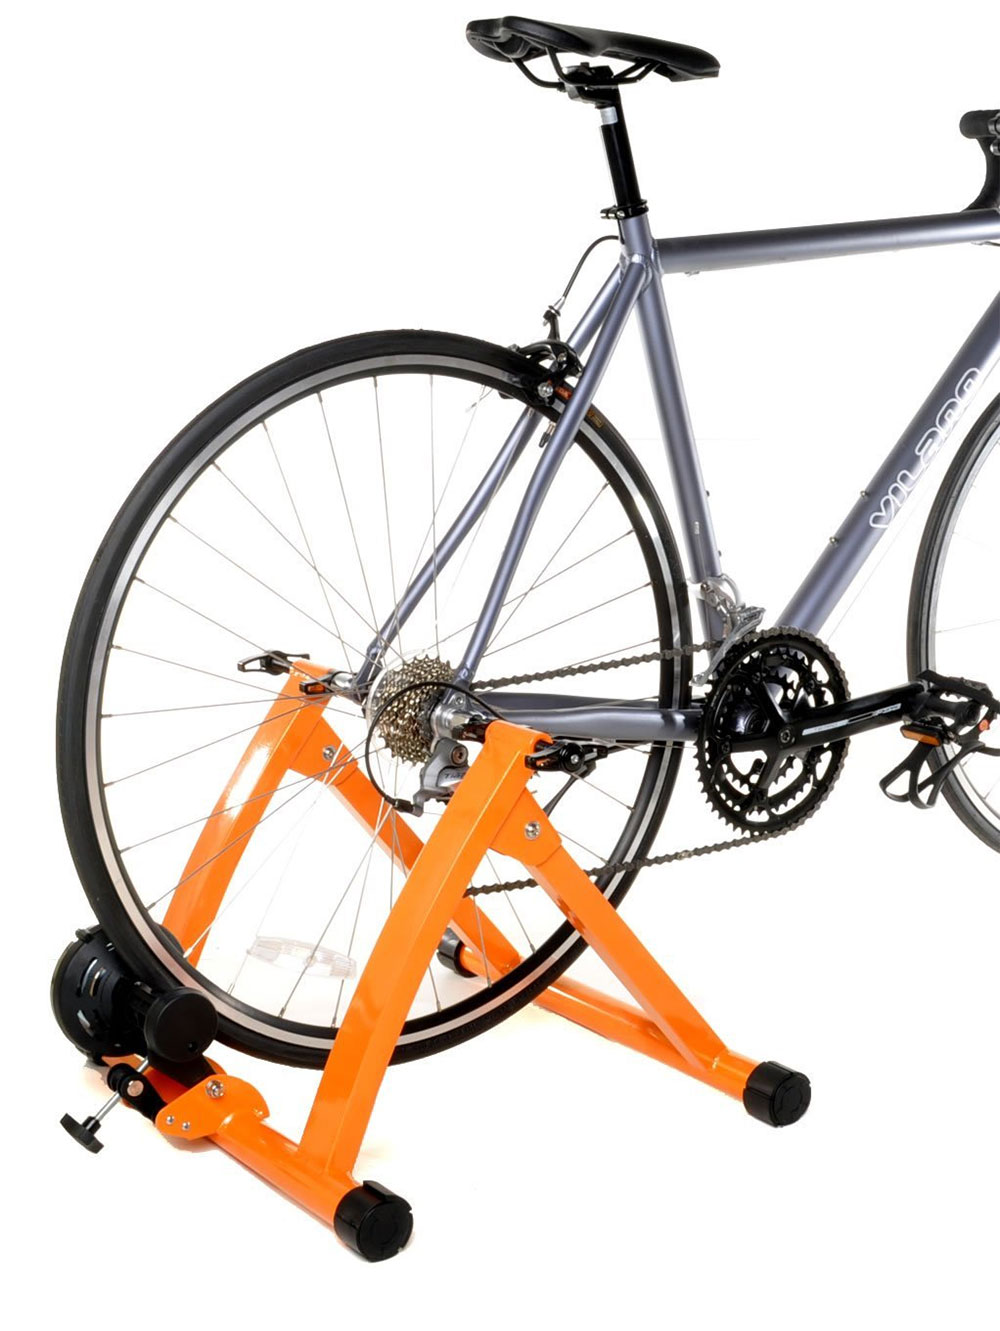 Bike Best Stationary Trainers